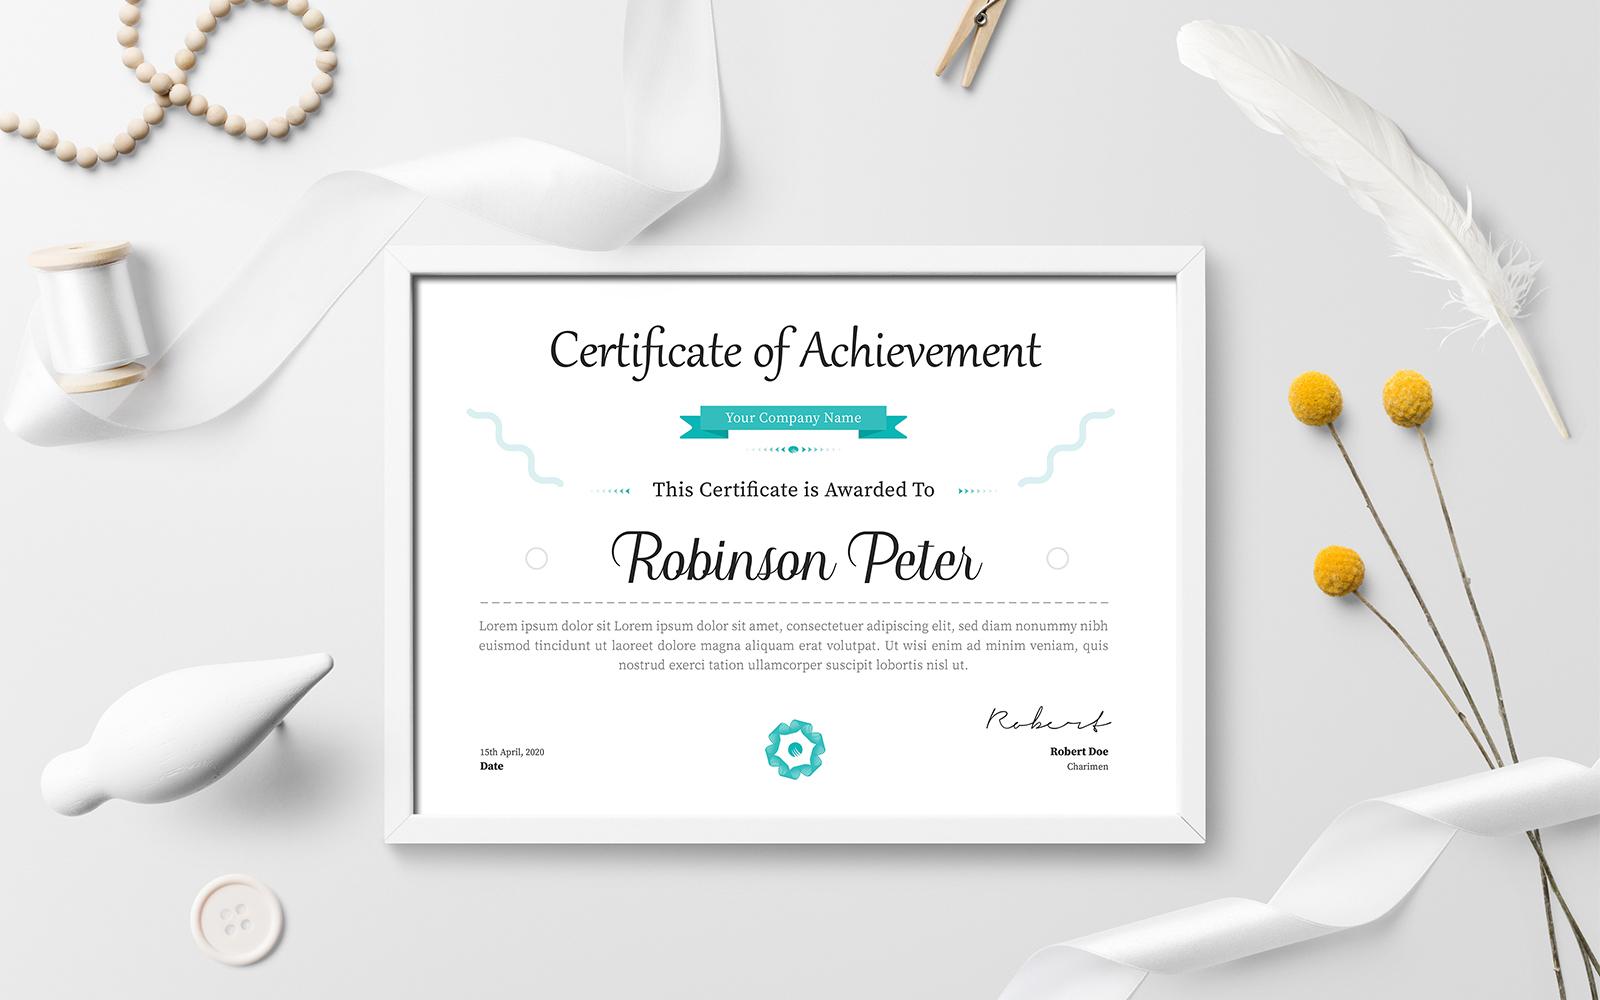 Robert Doe Certificate Template